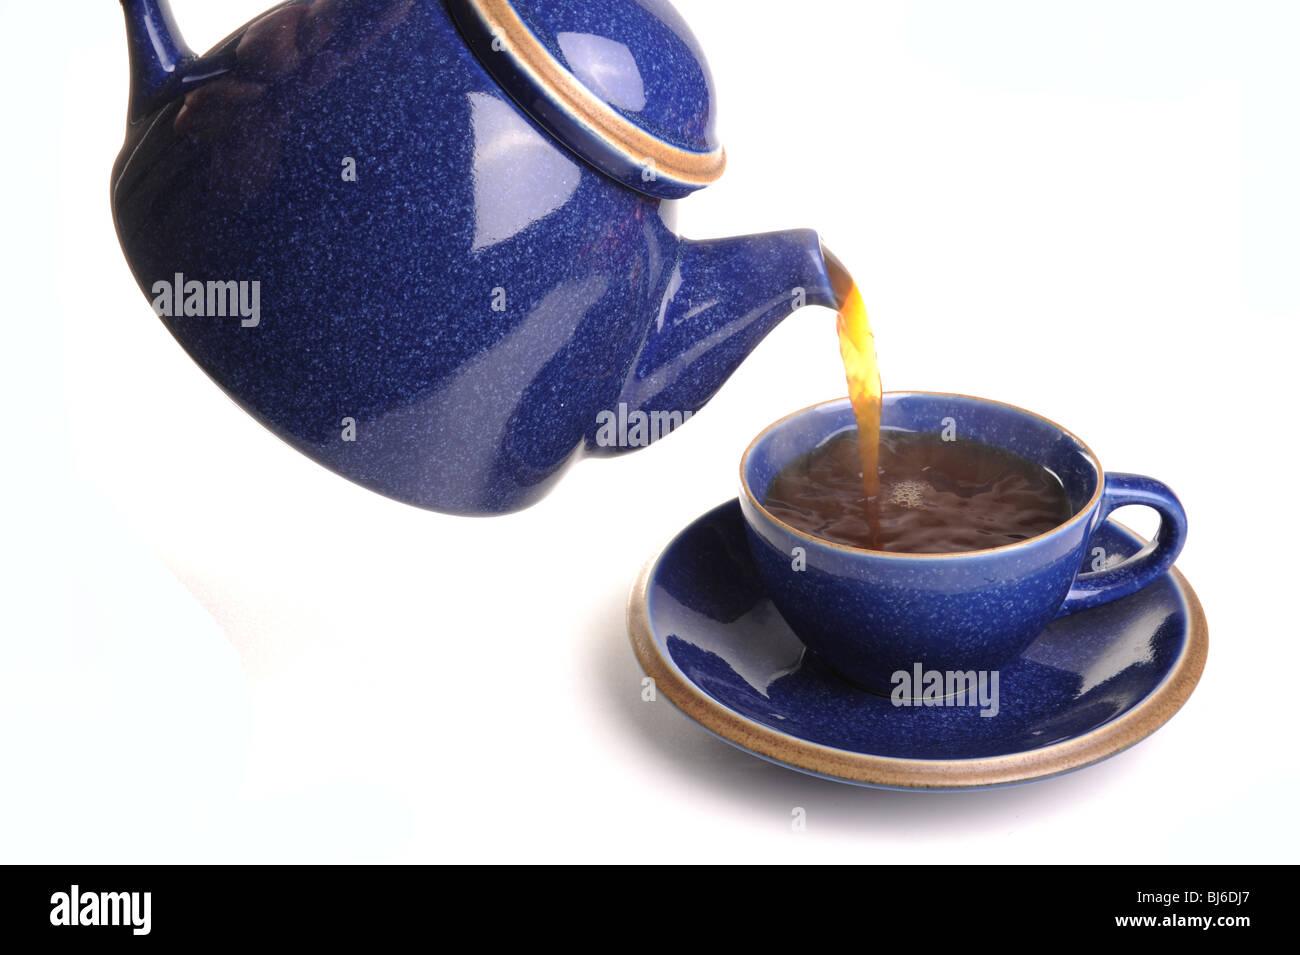 Tea pot pouring tea into a teacup, studio isolated - Stock Image